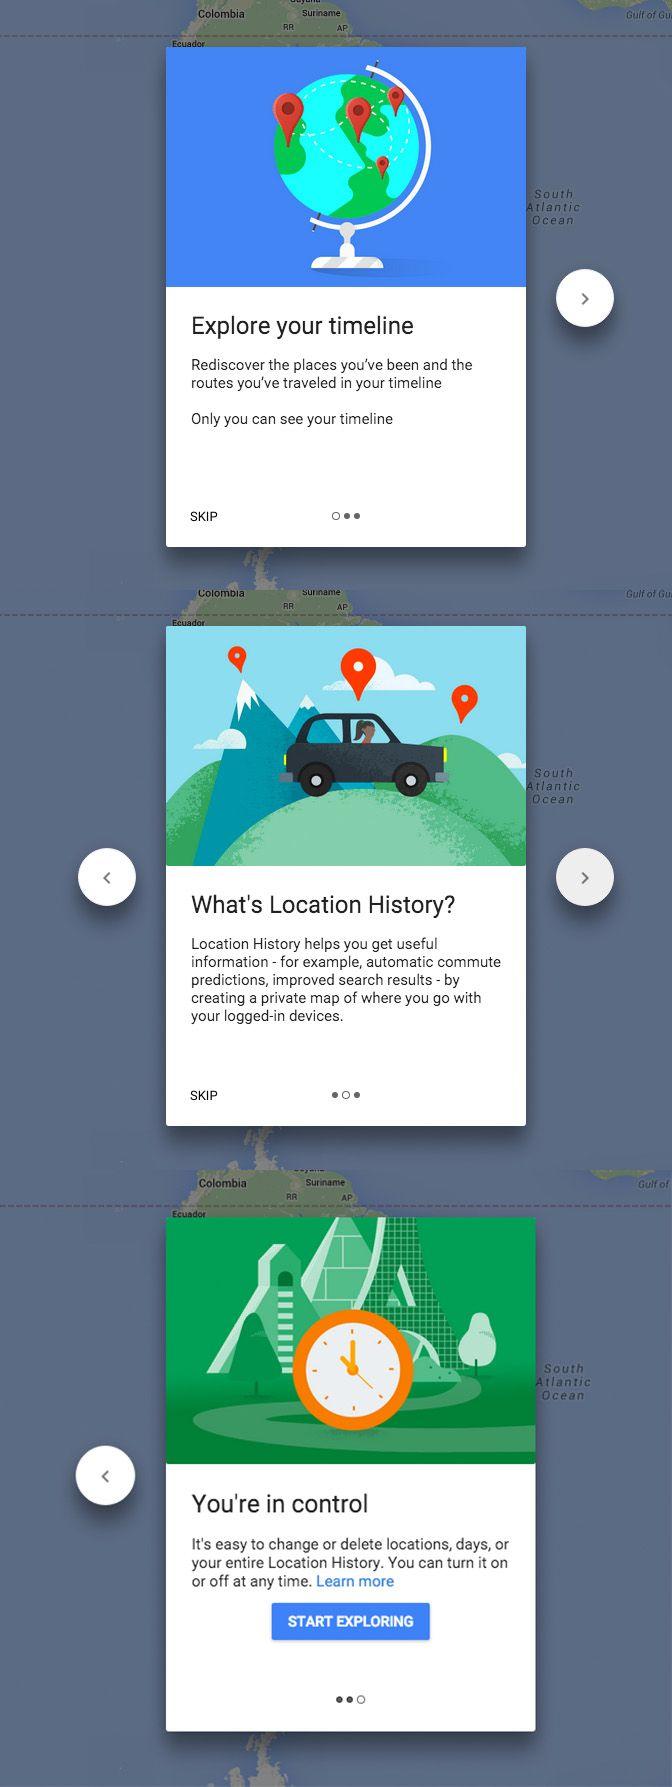 Google MAps Timeline onboarding